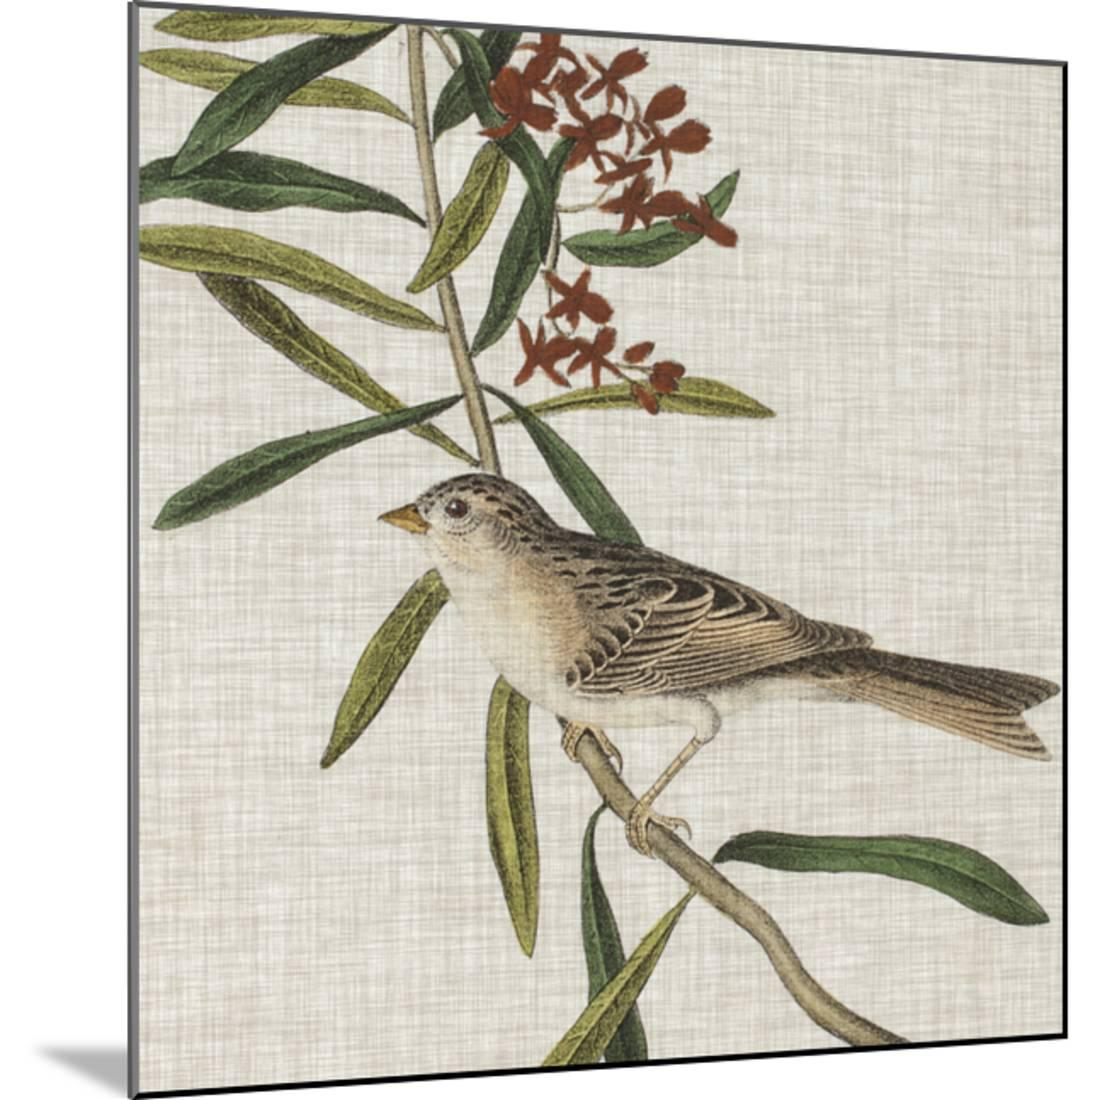 Avian Crop VII Wood Mounted Print Wall Art By John Audubon - Walmart